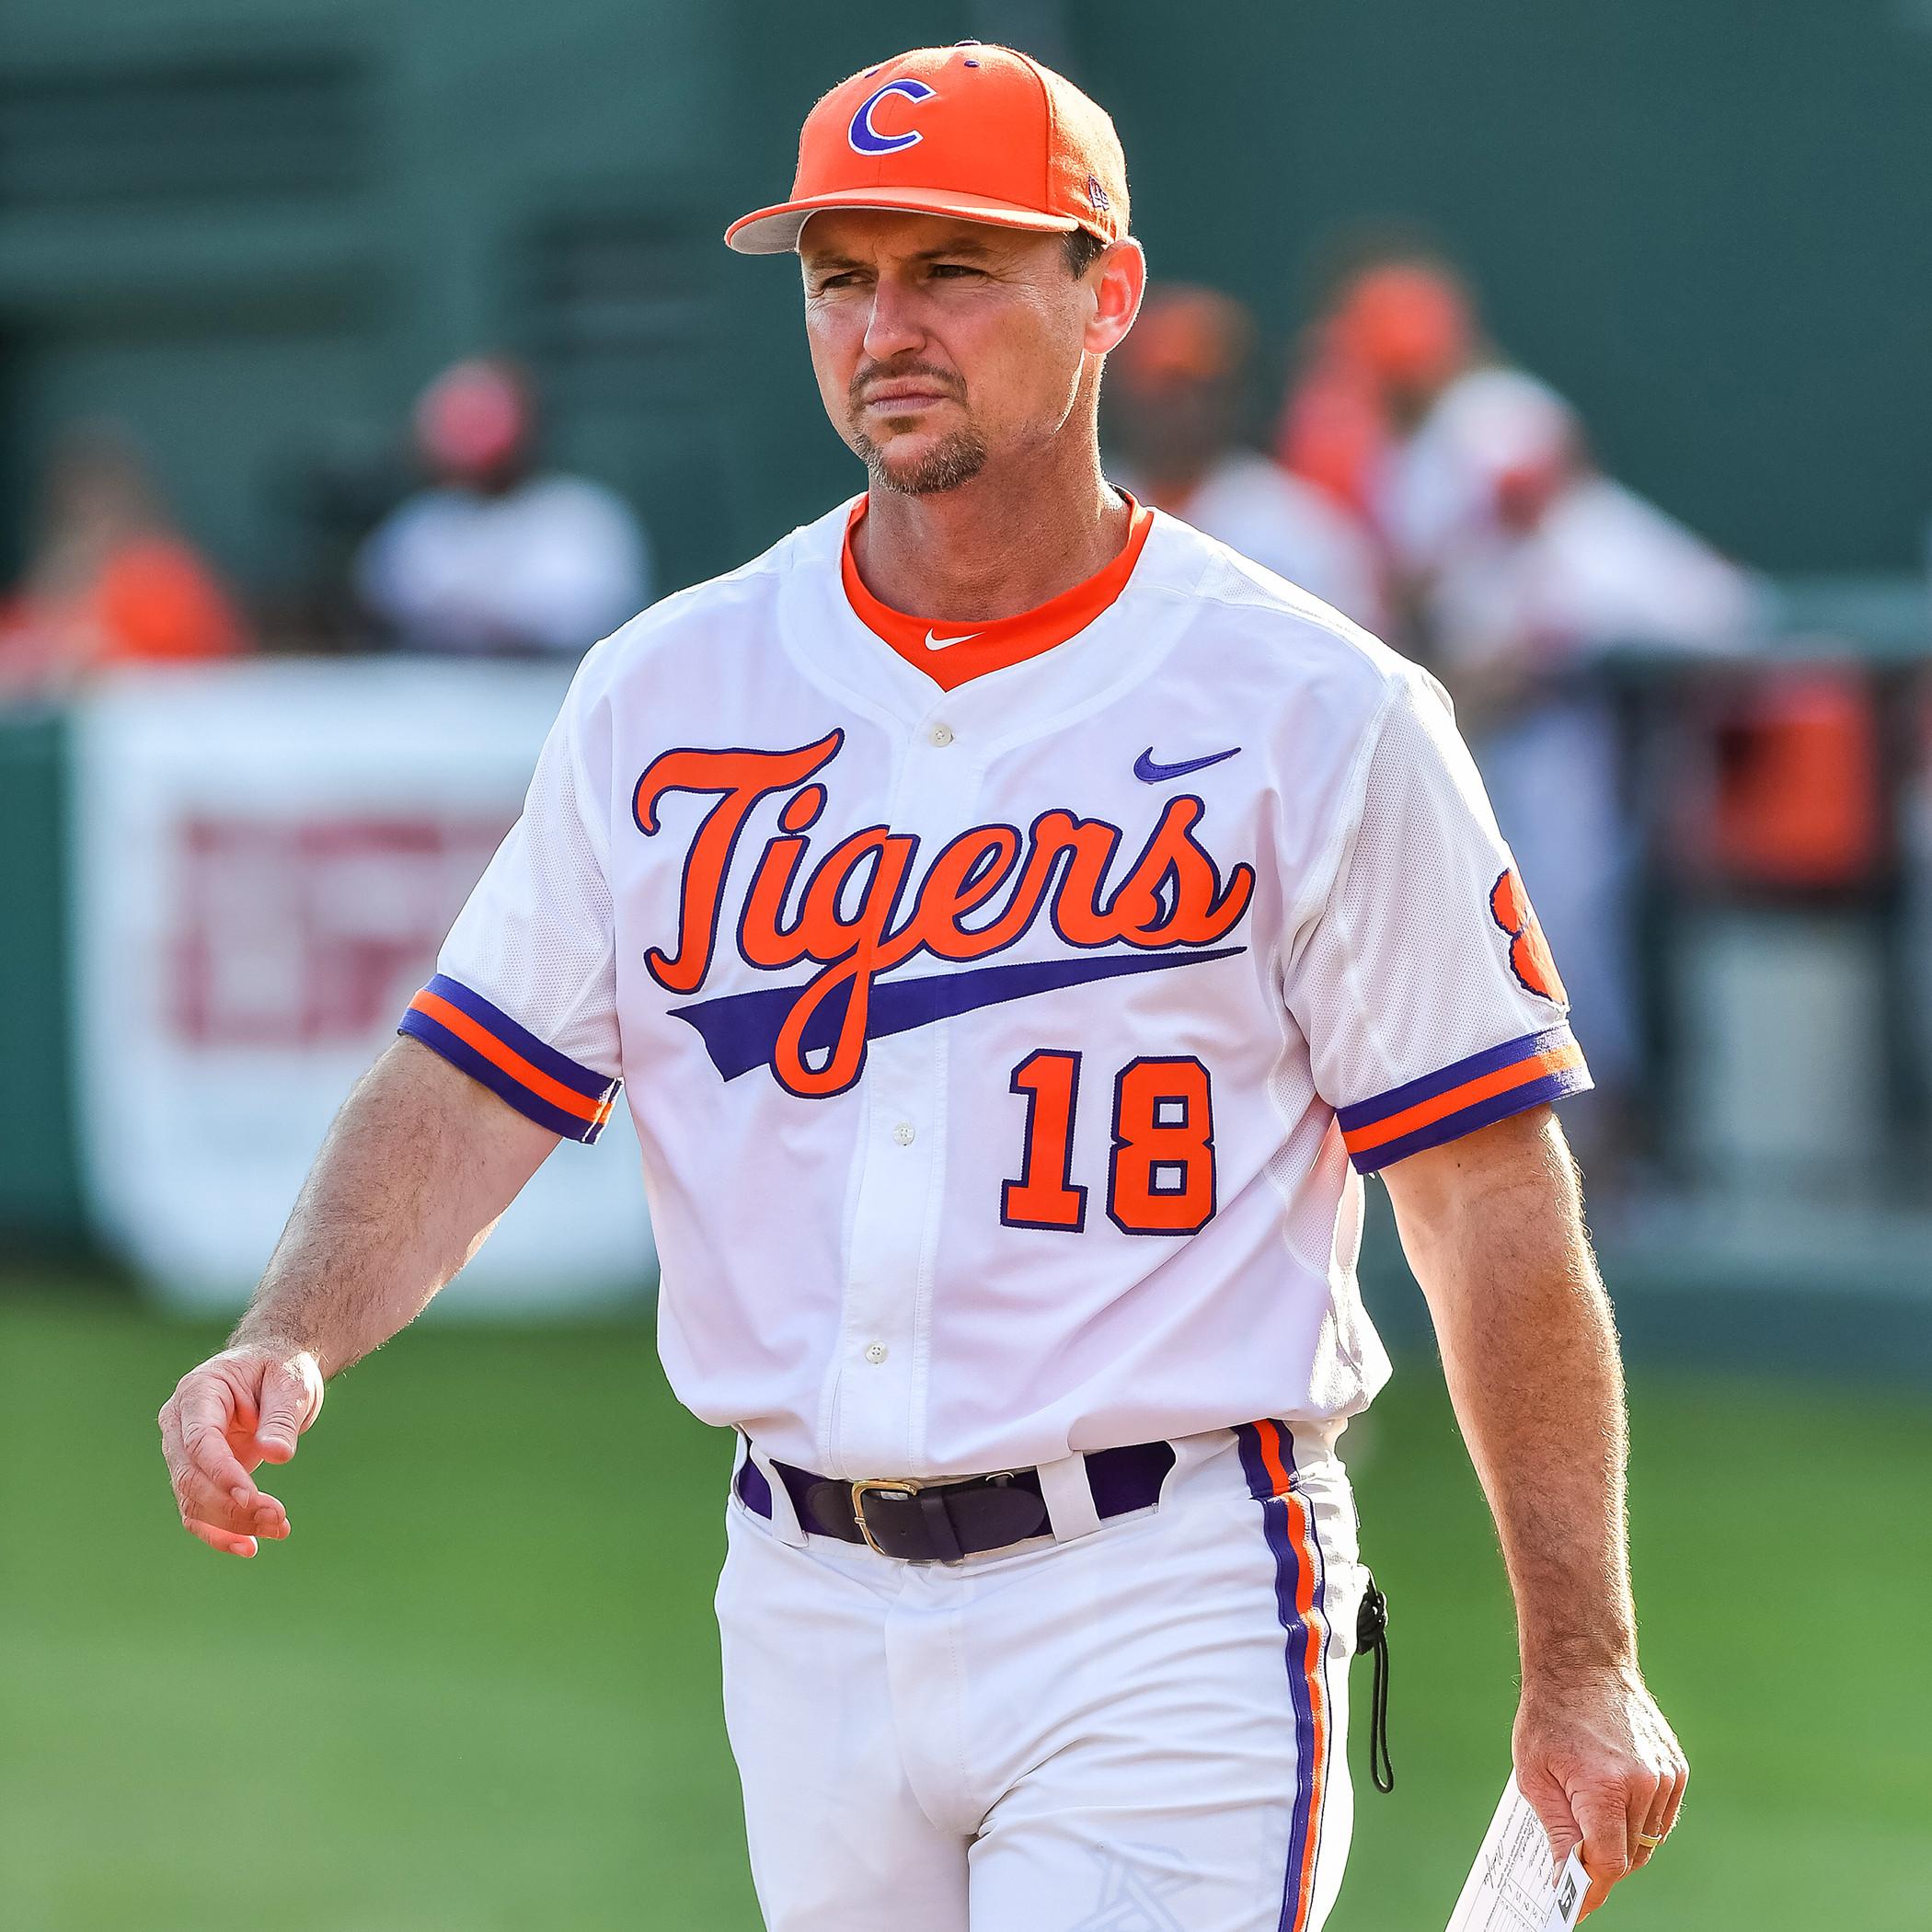 Lee, Baseball Coaches Receive Raises & Extensions